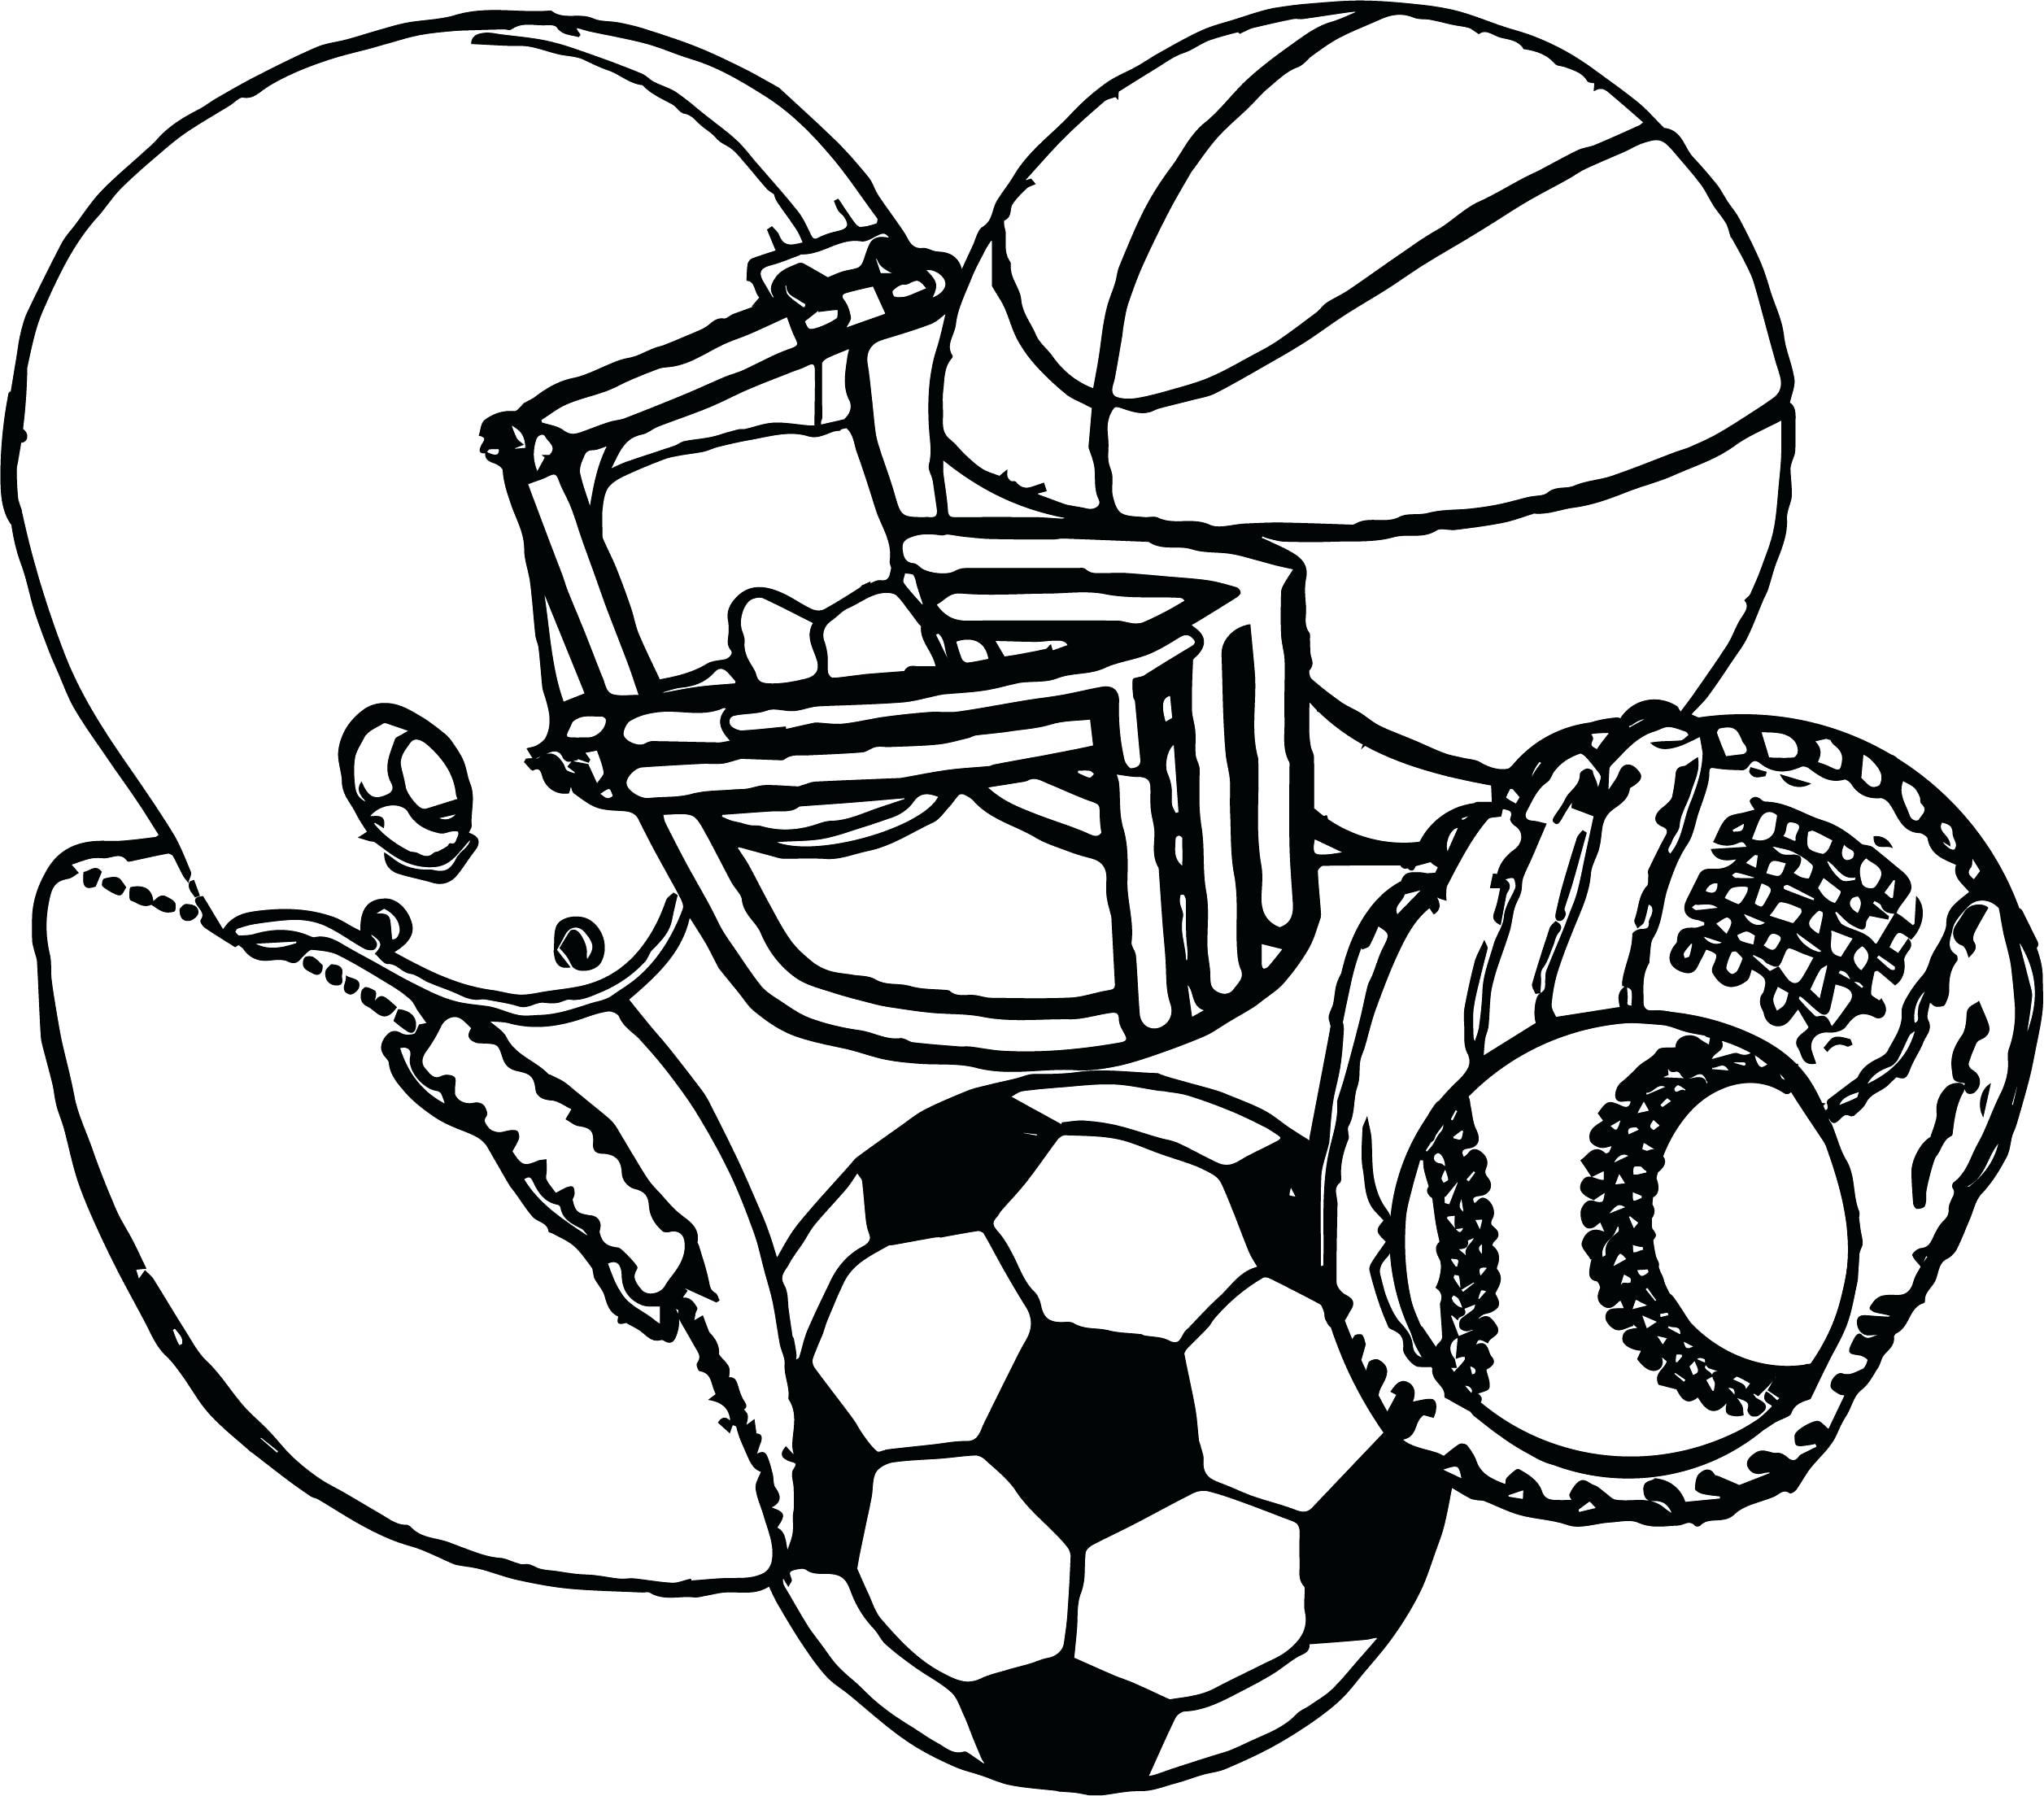 2513x2208 Luxury New Patriots Logo Coloring Pages Broncos Broncos Coloring